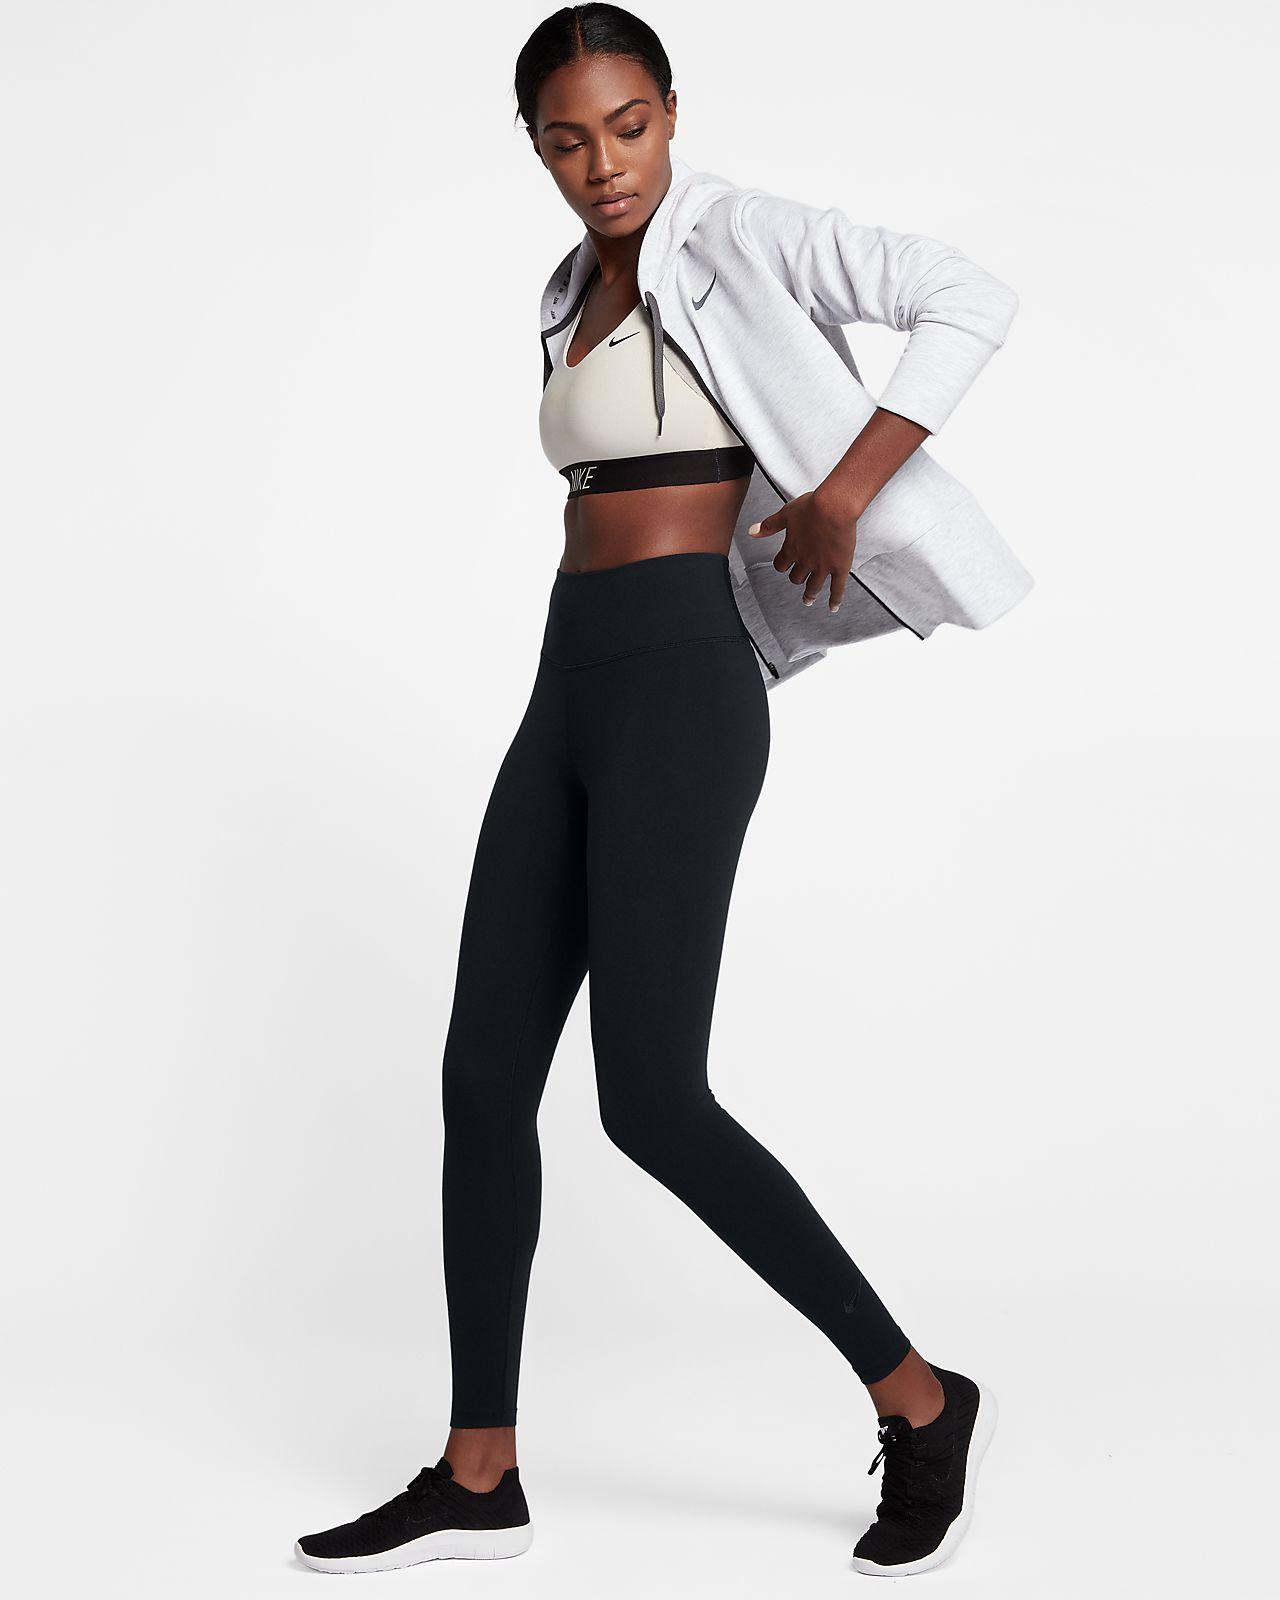 5ca99de3237da Nike Sculpt Lux Women's High-Waist Training Tights. Nike.com CA